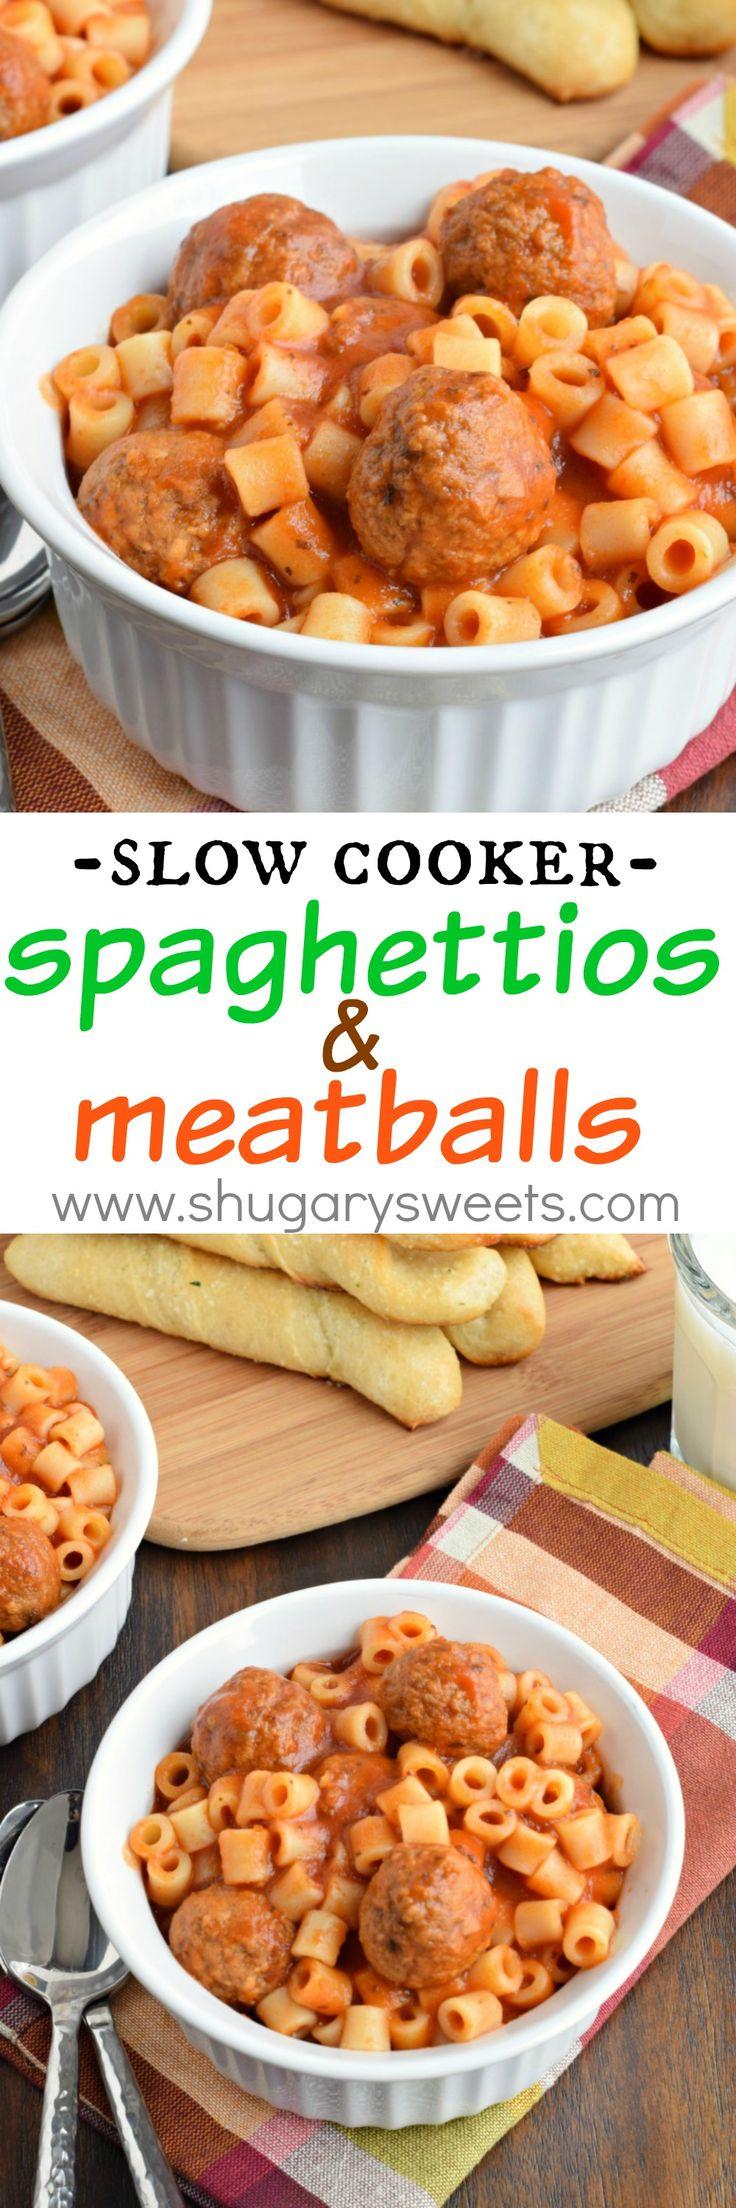 Homemade Spaghettios and Meatballs - Shugary Sweets